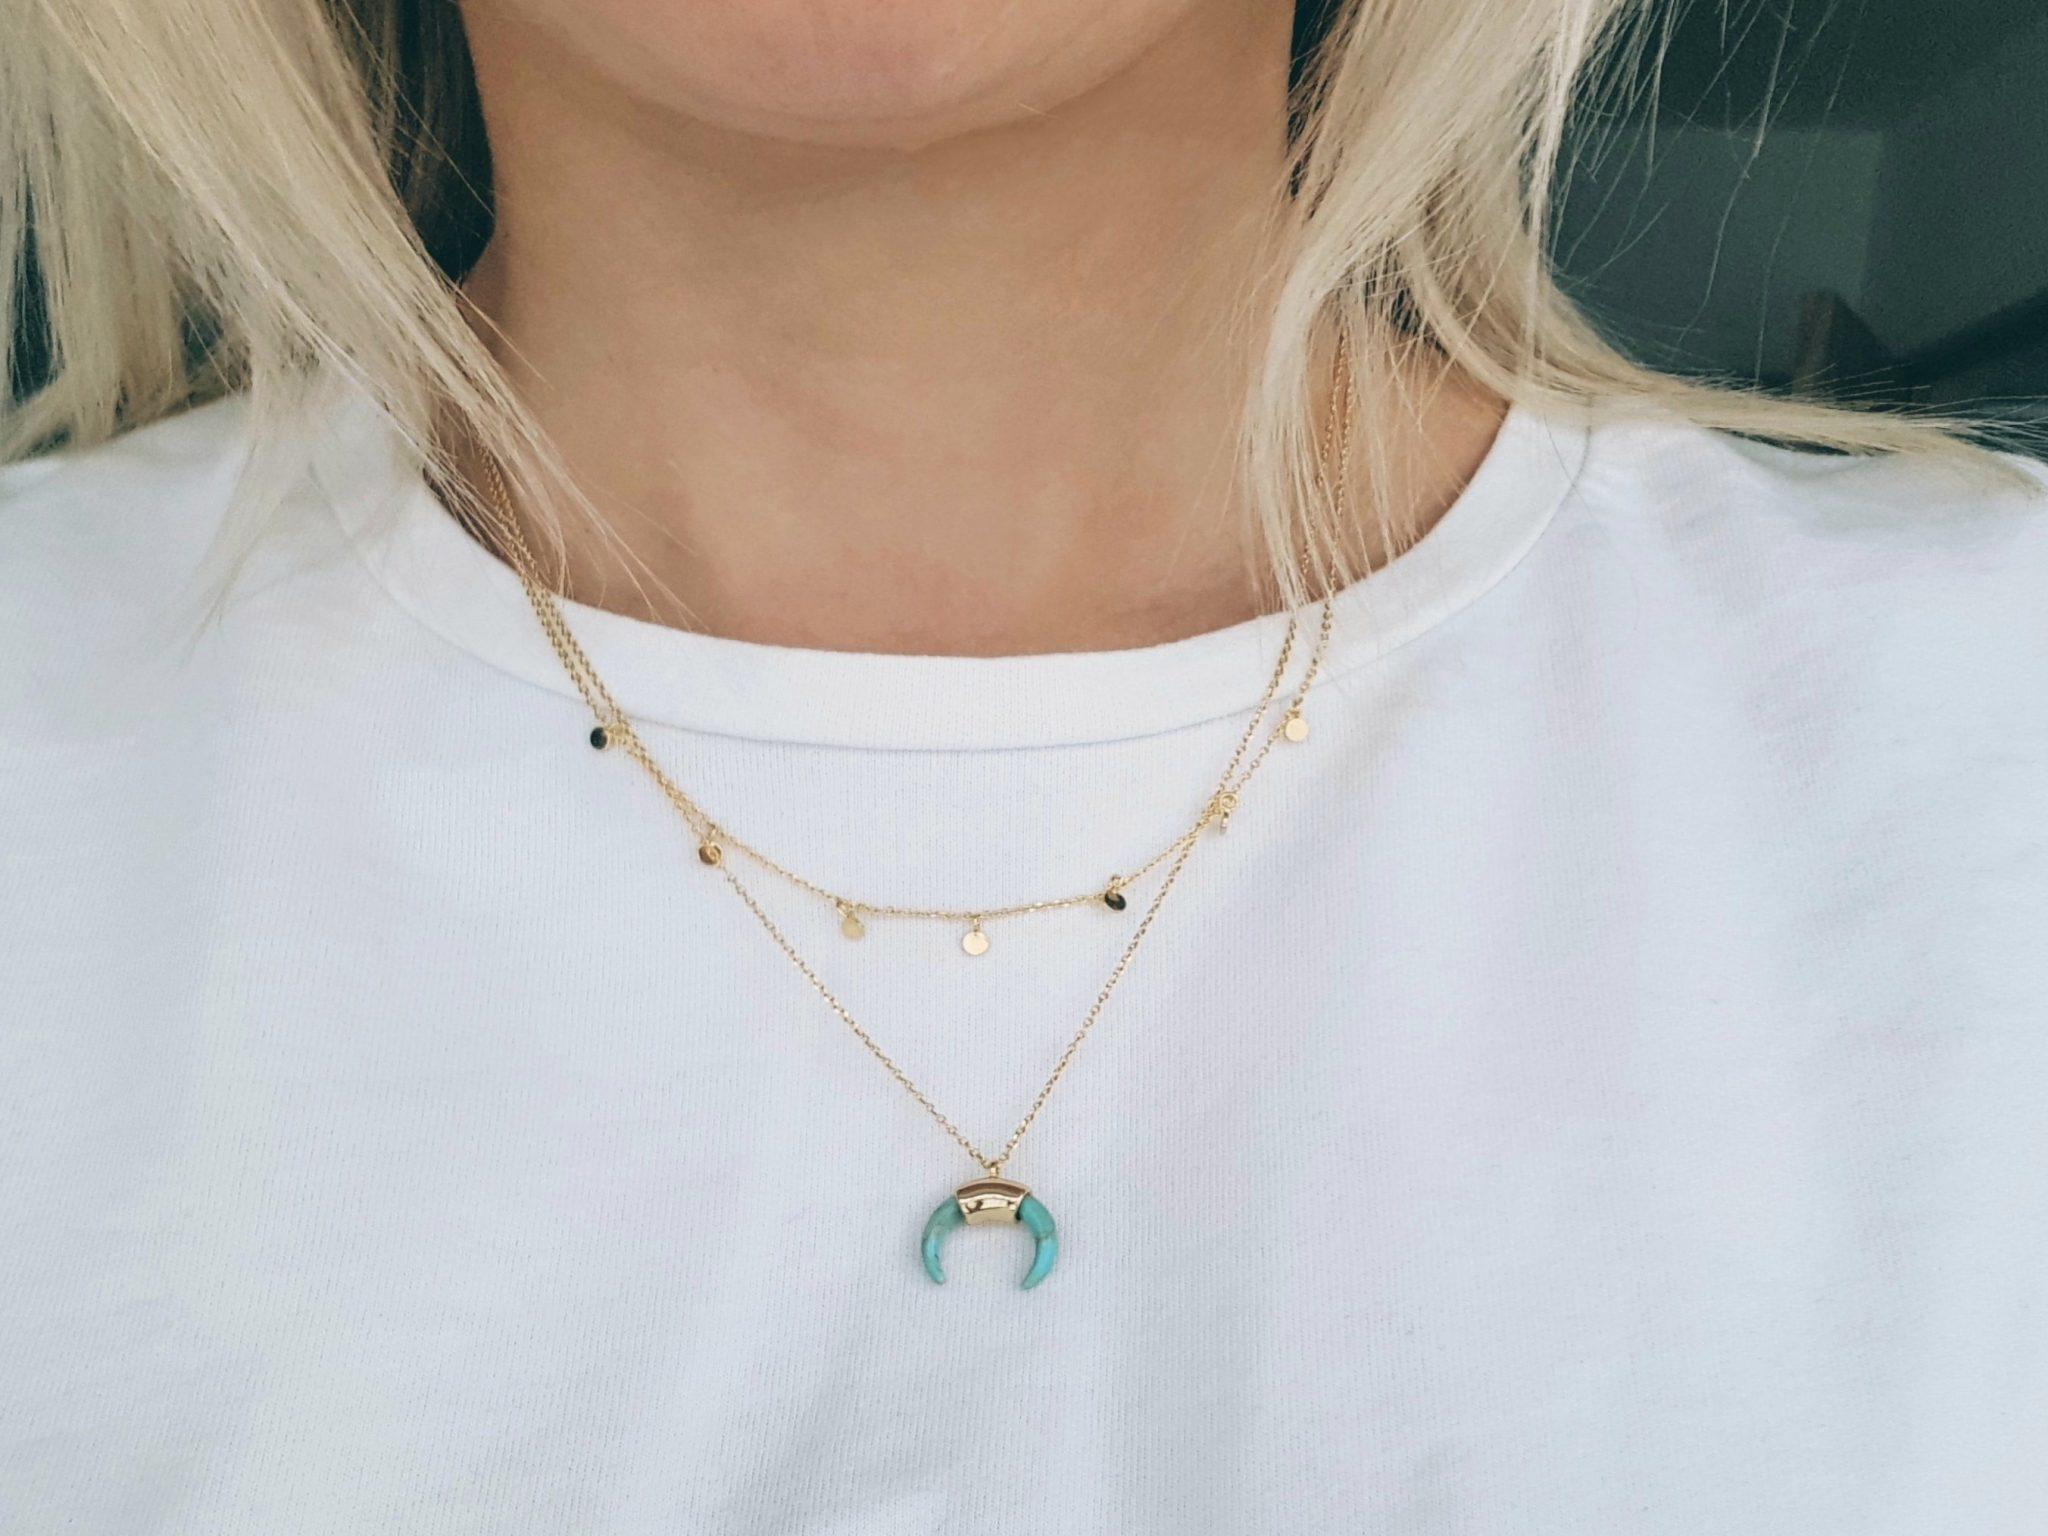 Orellia Jewellery tusk necklace